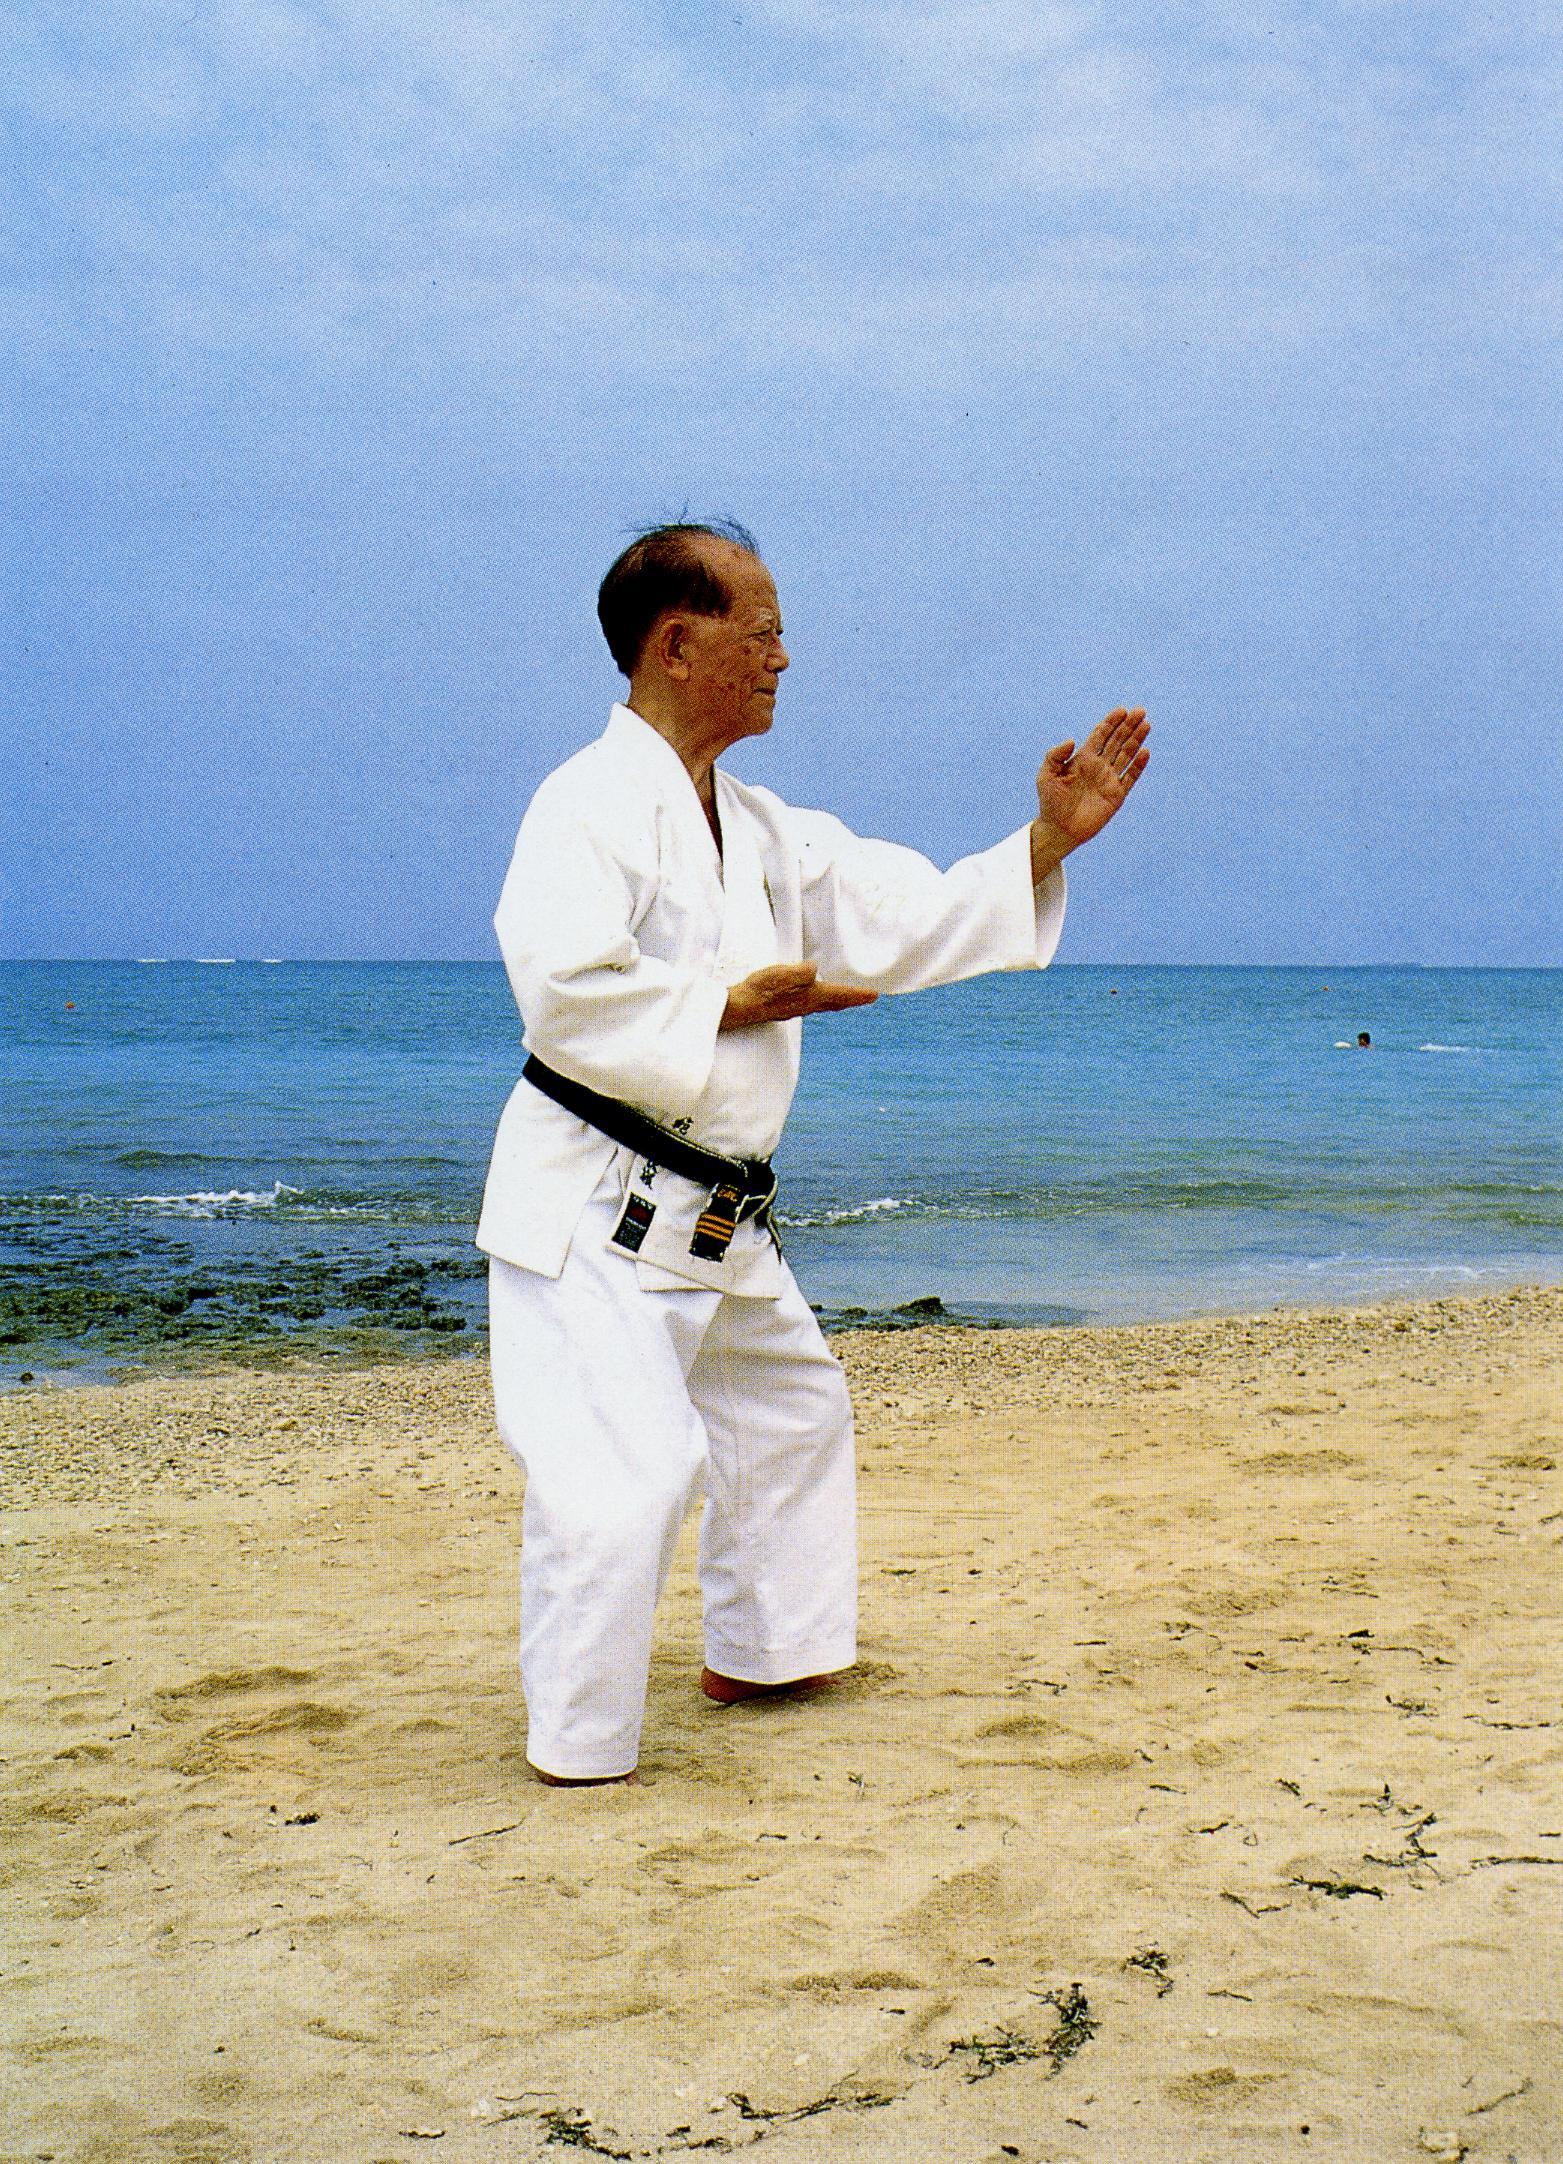 Grand Master Nagamine performing neko-ashi dachi, chudan shoto shuto-uke on the beach